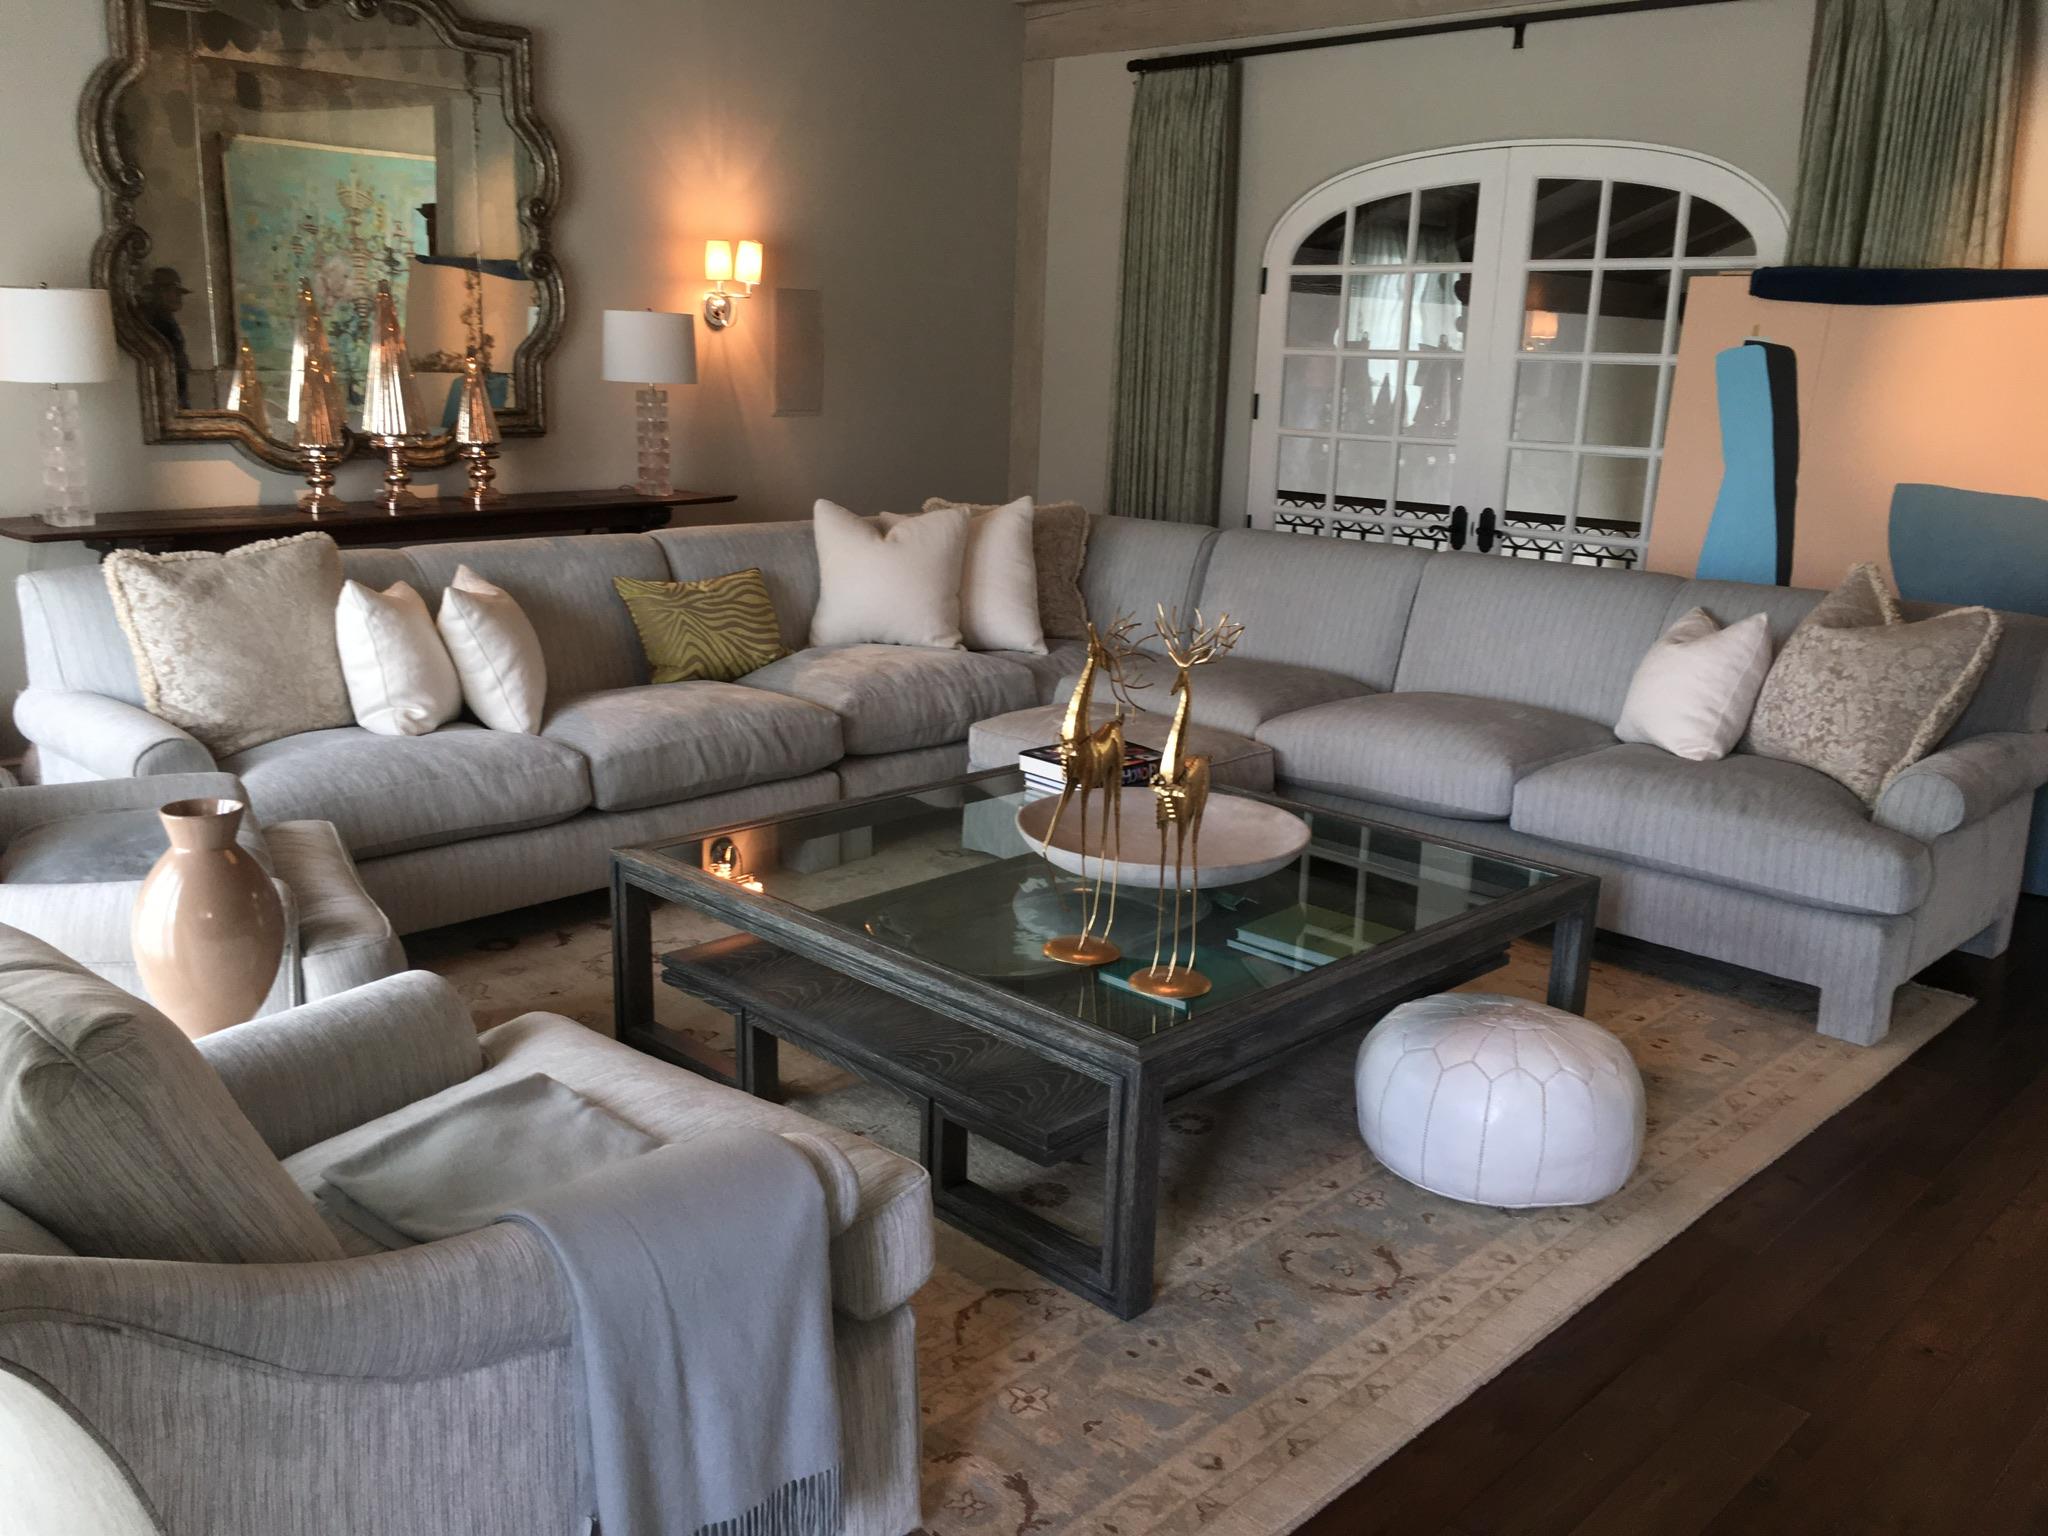 Upholstery Furniture 1 Upholstery Furniture 2 ...